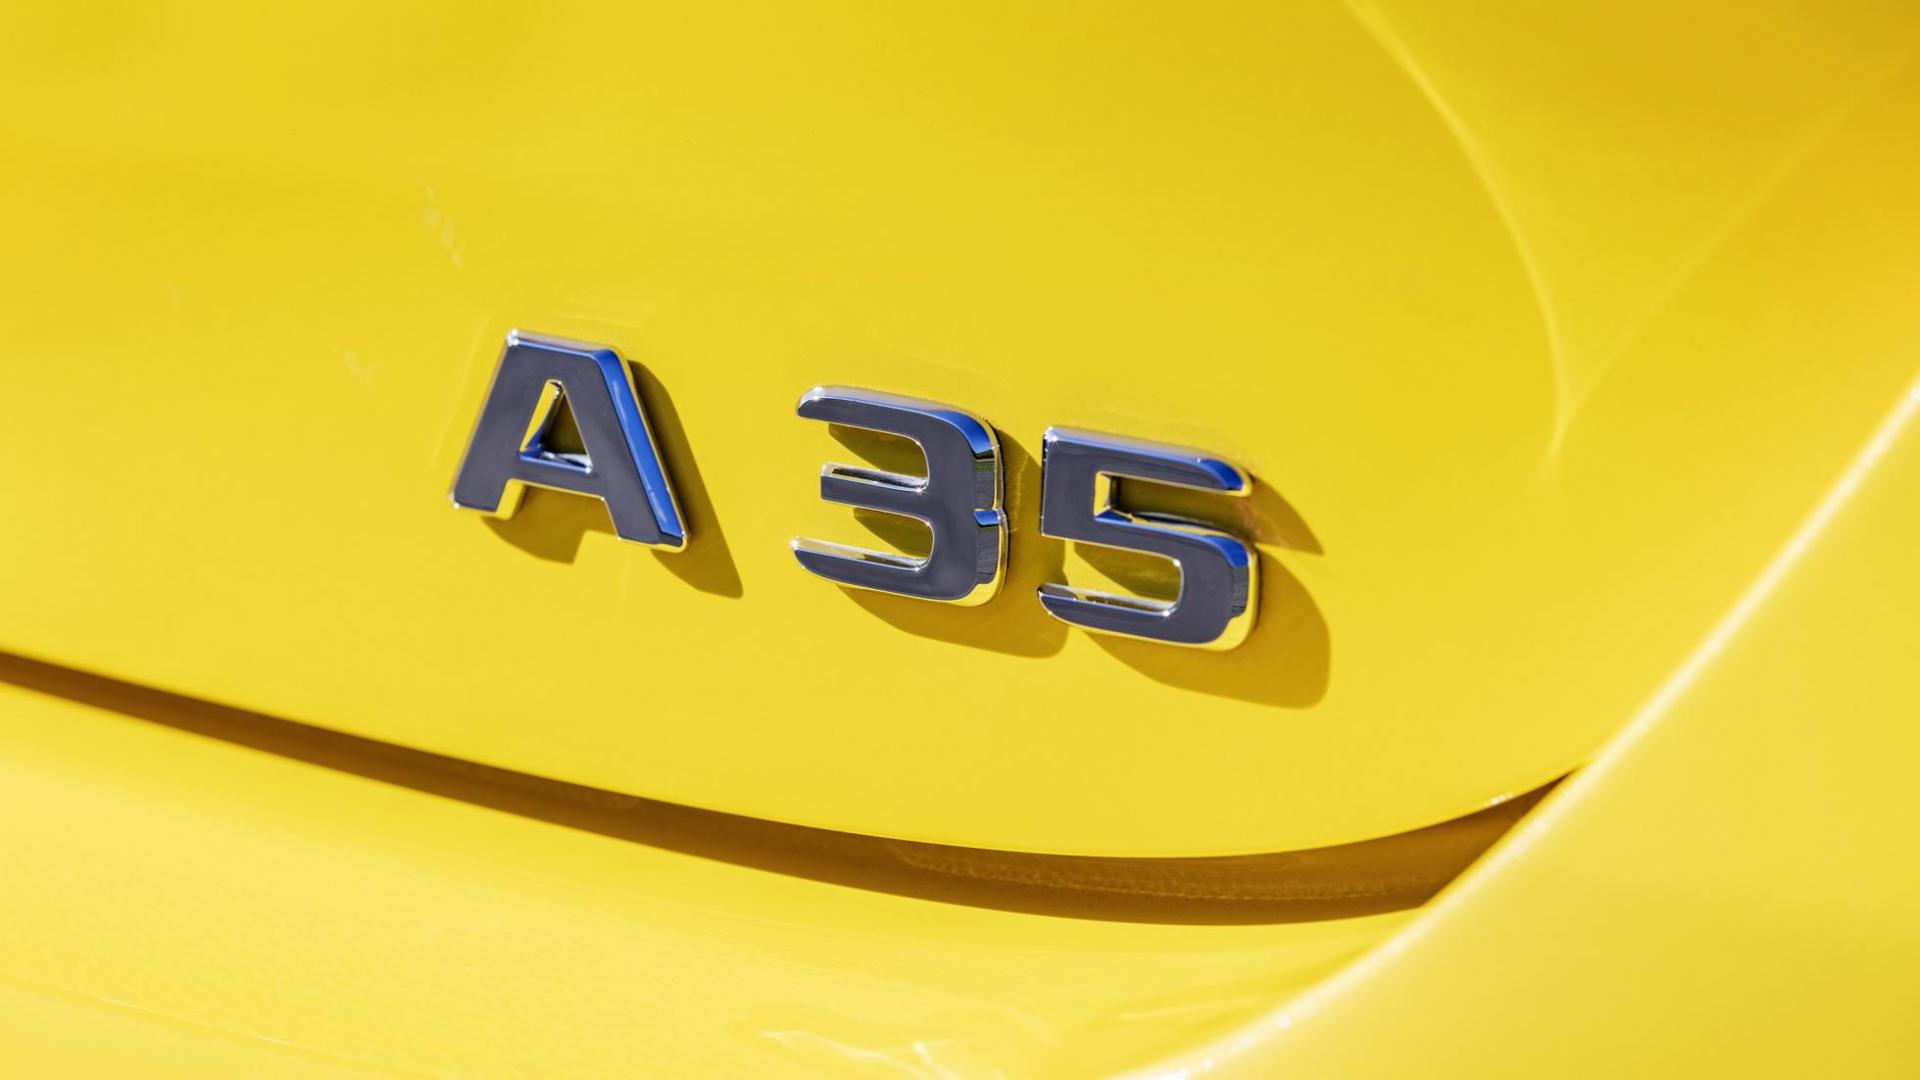 Mercedes-AMG A35 hot hatch logo